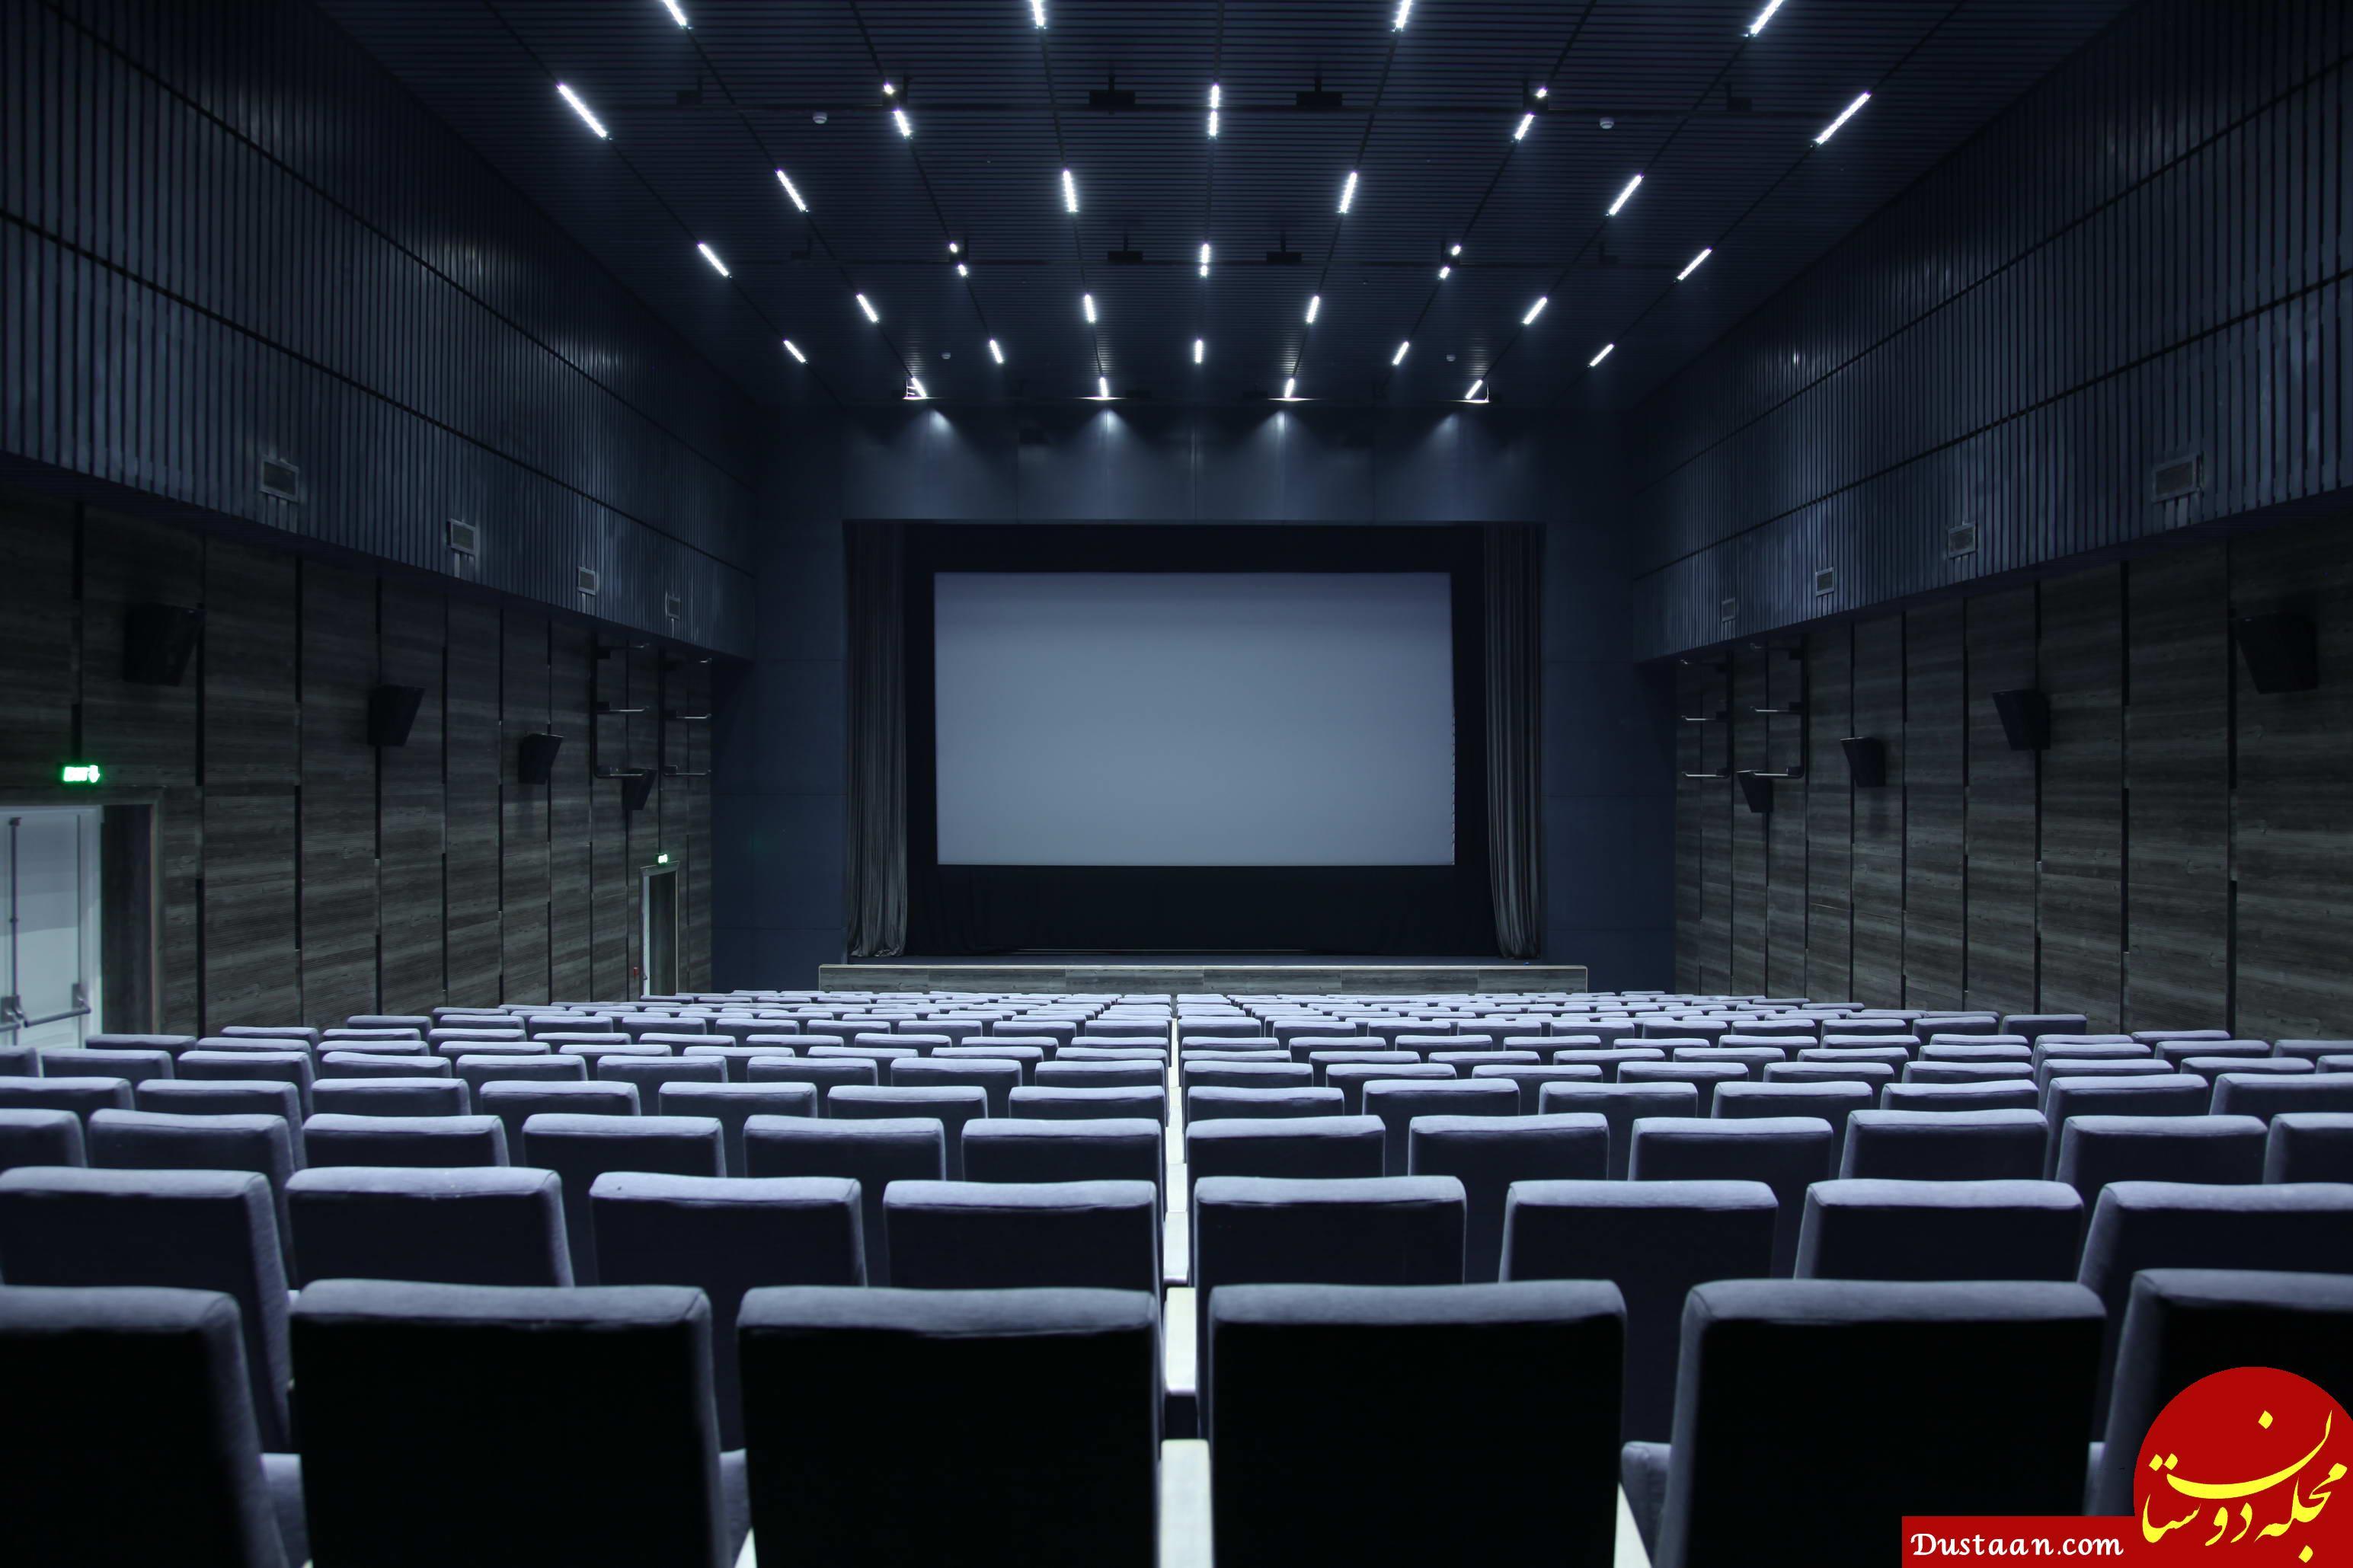 www.dustaan.com بلیت سینما گران شد/ ۱۵ هزار تومان